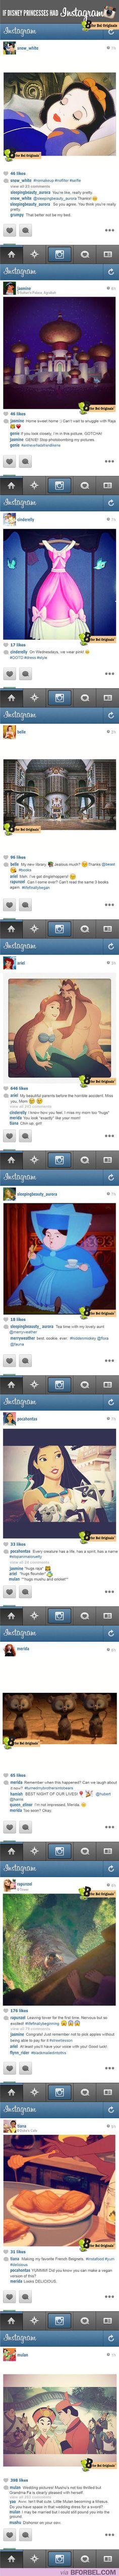 If disney princesses had Instagram...haha love this!